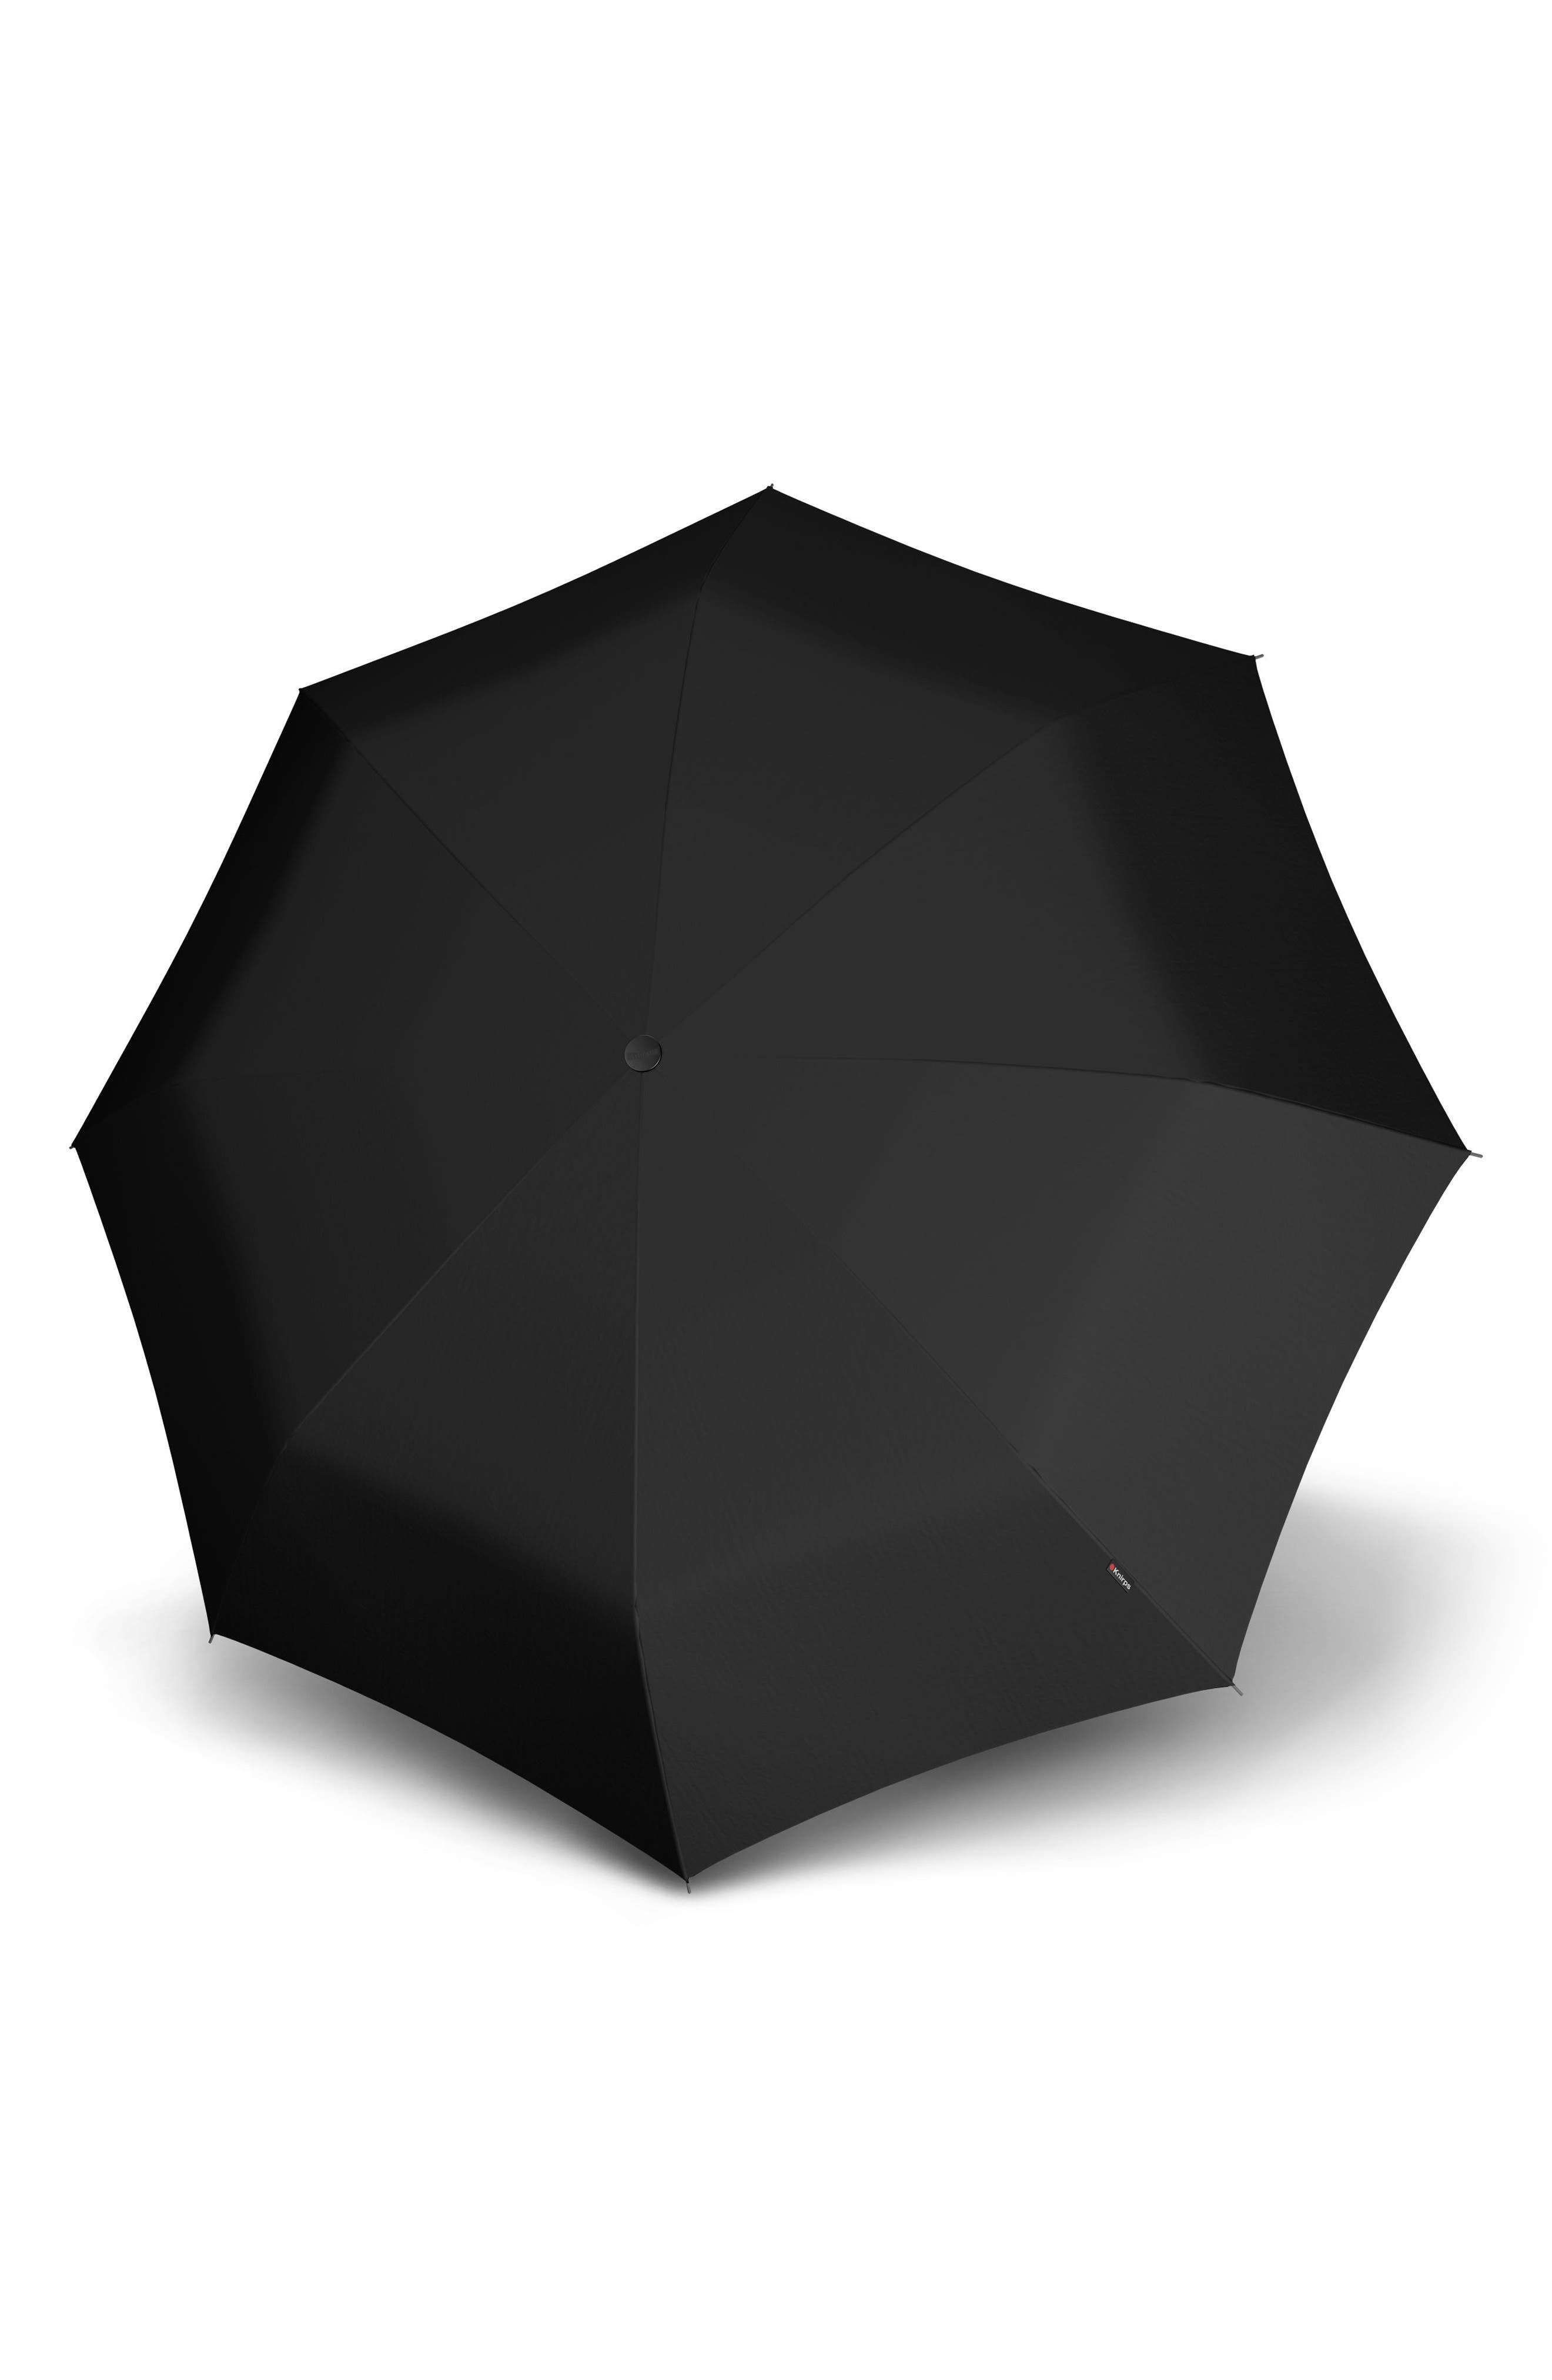 T2 Duomatic Compact Auto Open/Close Umbrella,                             Main thumbnail 1, color,                             Black